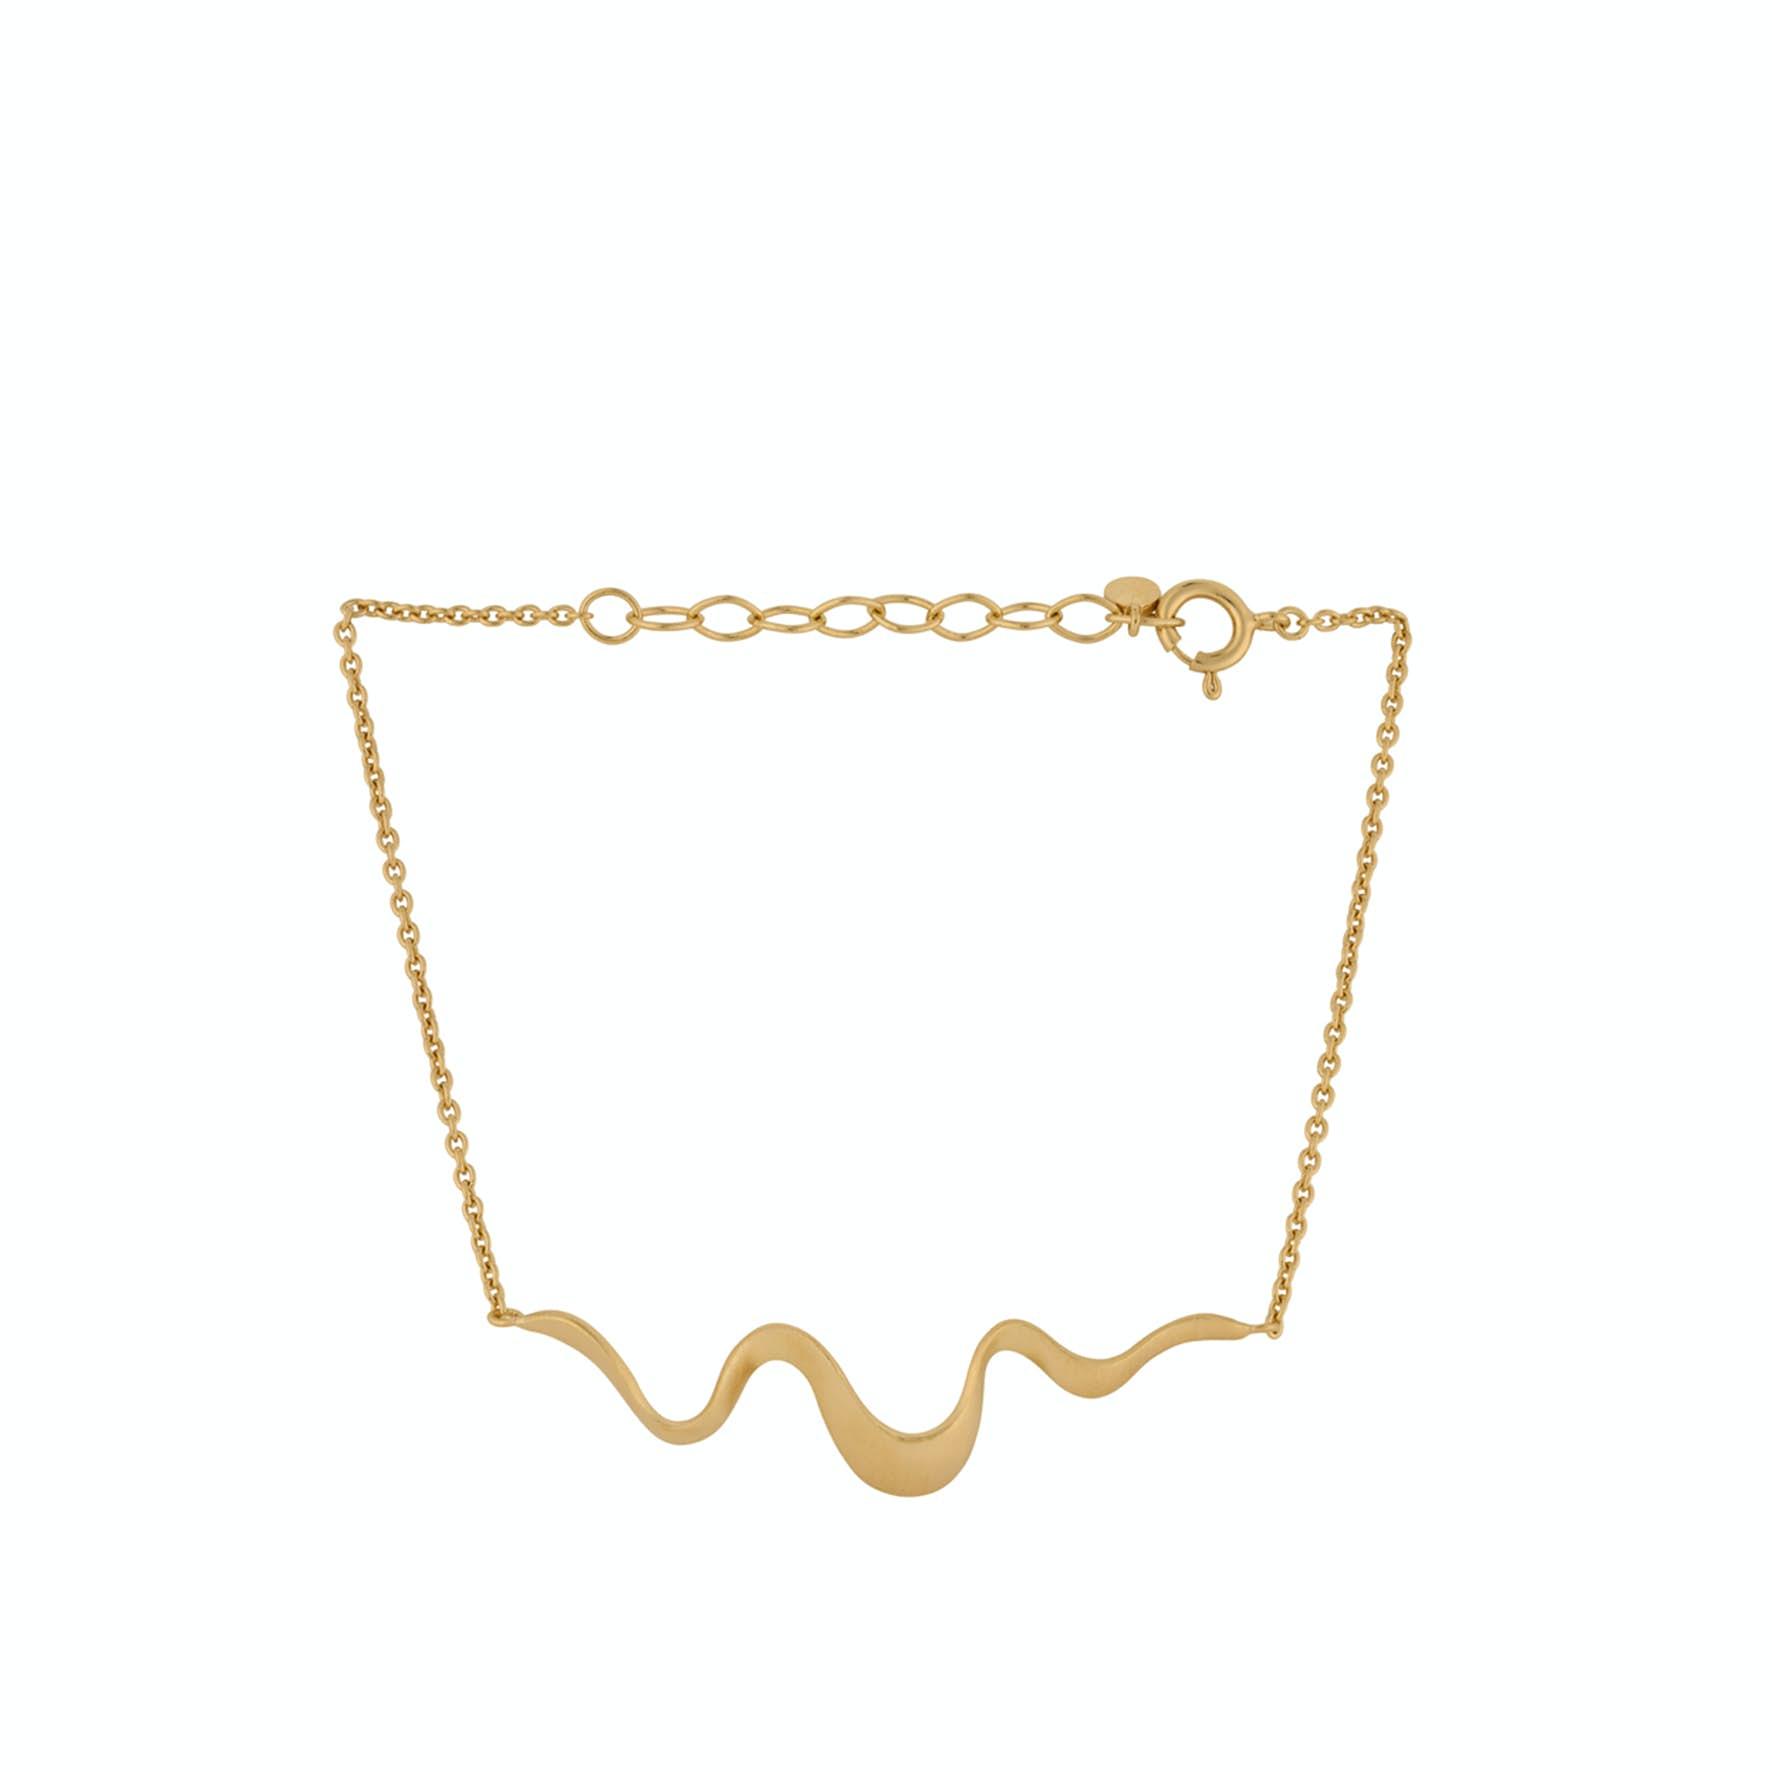 Wave Bracelet von Pernille Corydon in Vergoldet-Silber Sterling 925